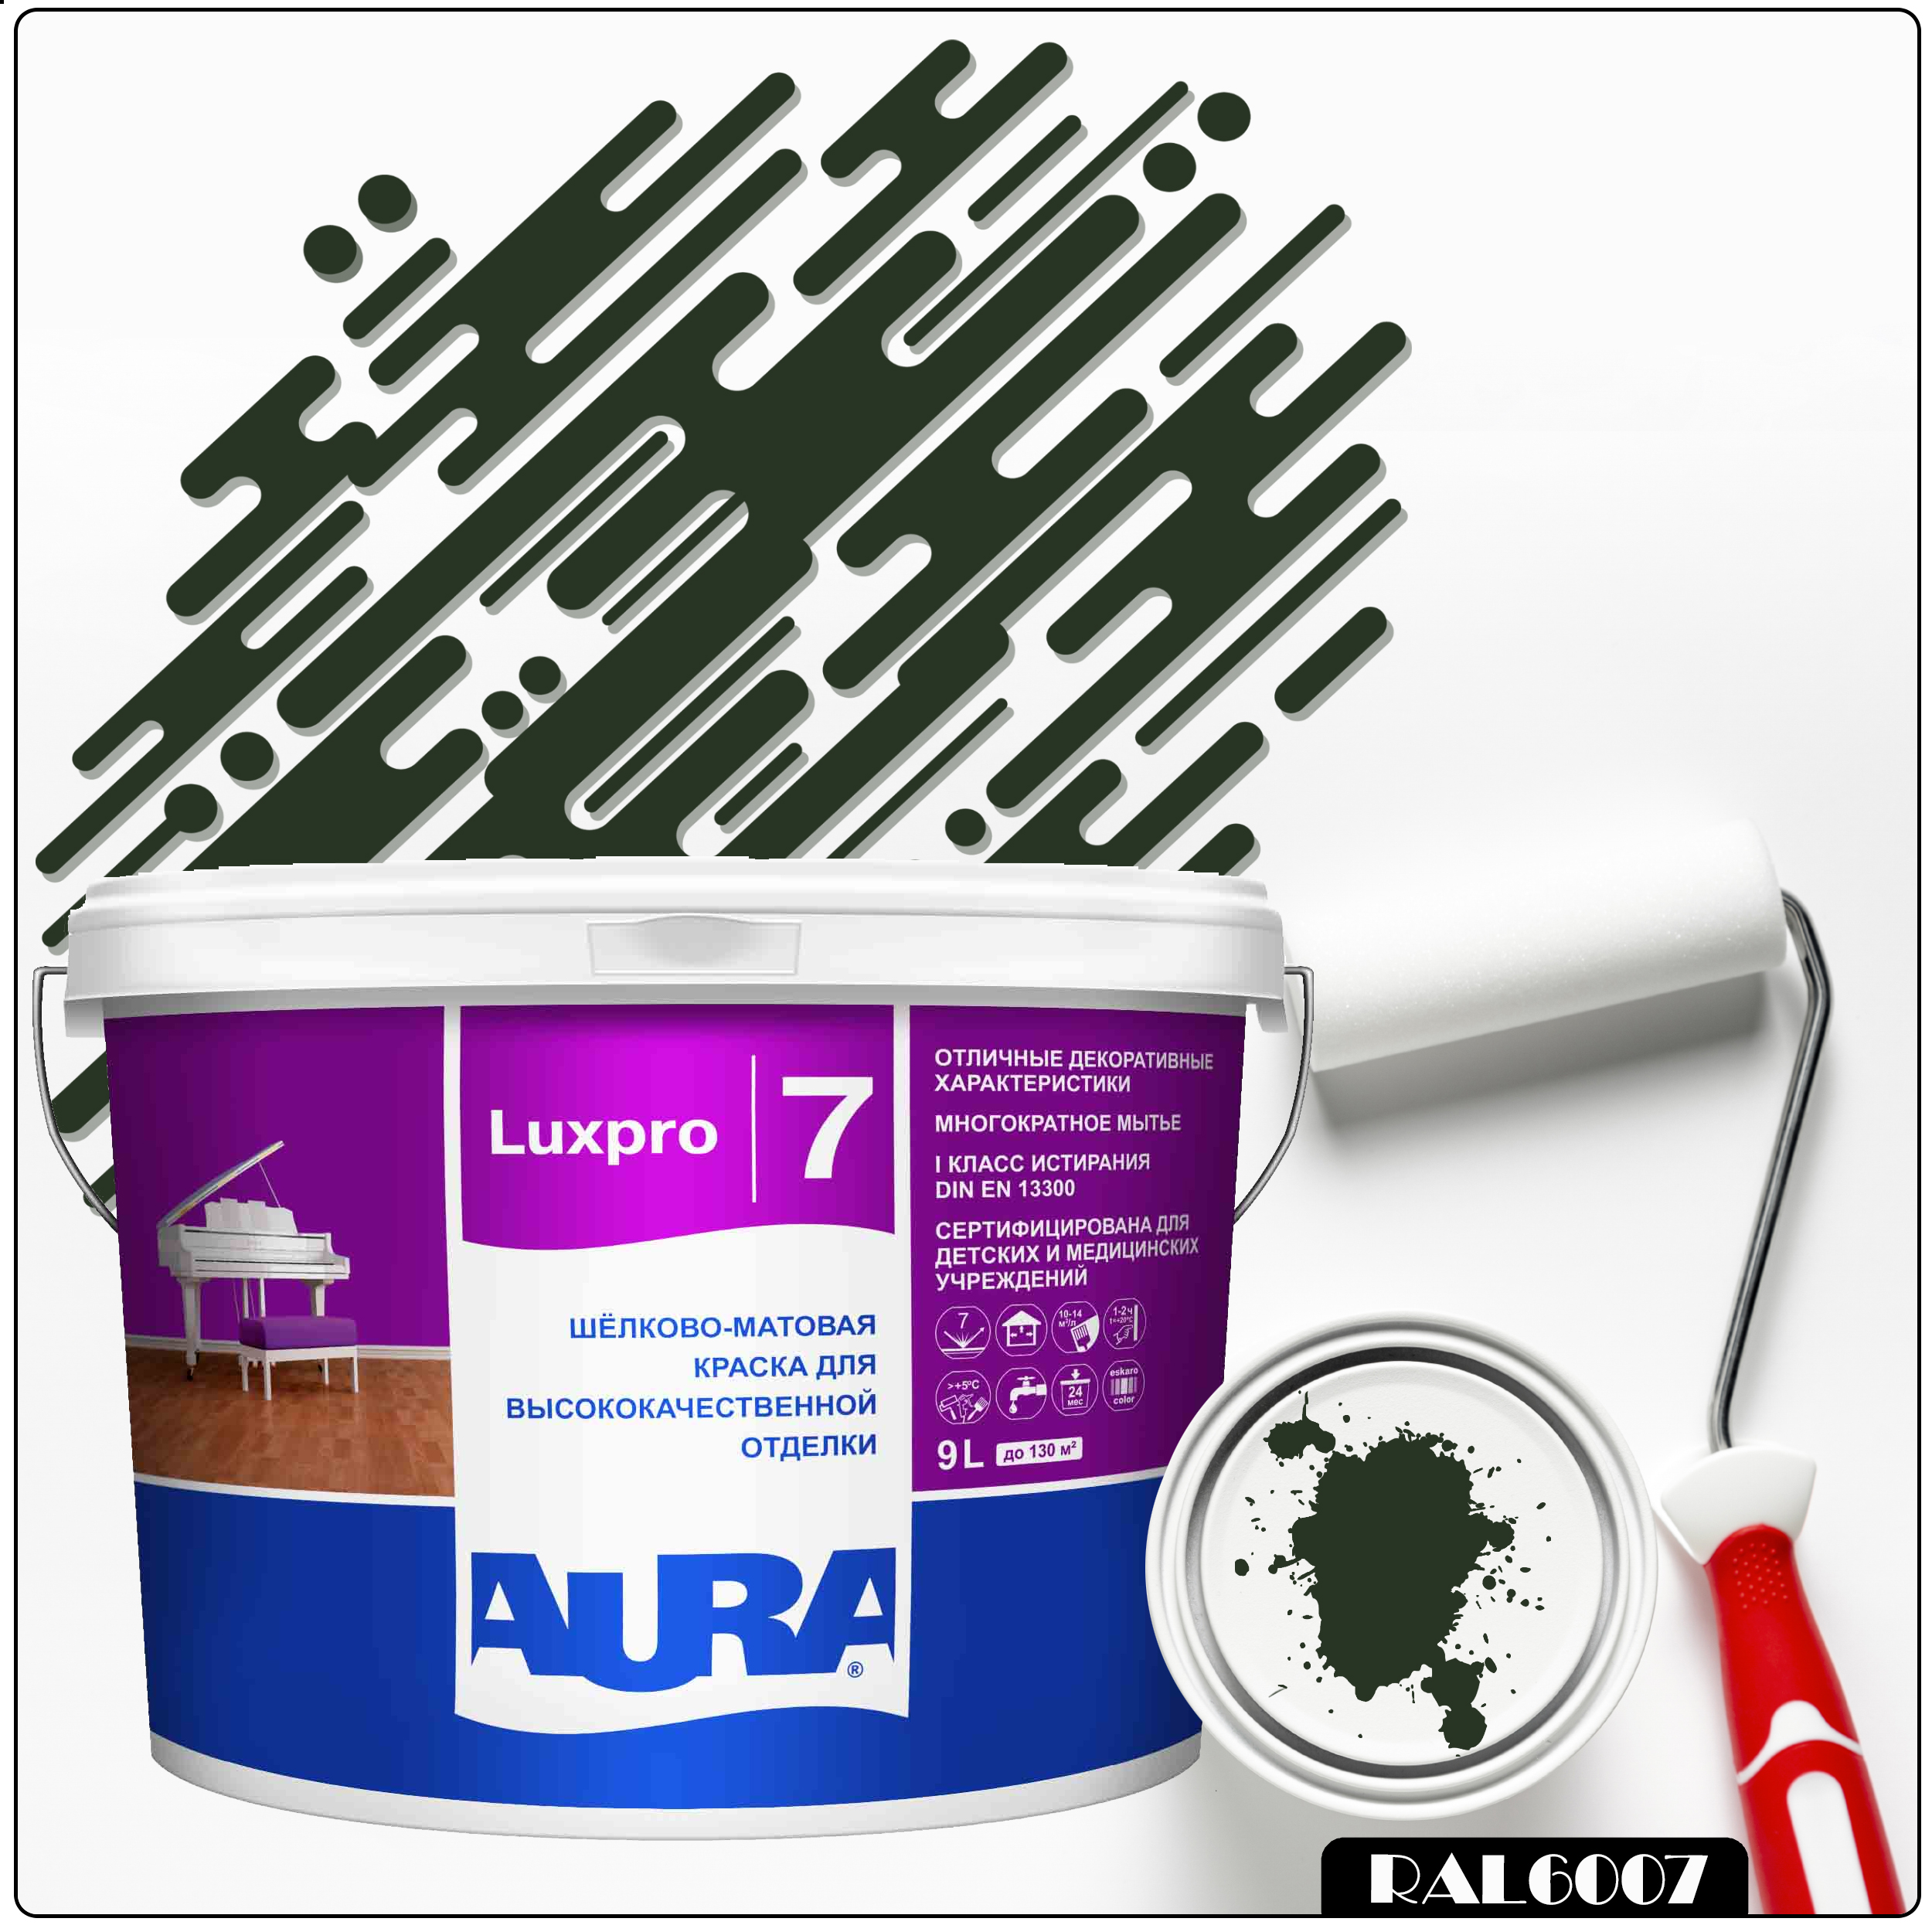 Фото 8 - Краска Aura LuxPRO 7, RAL 6007 Бутылочно-зеленый, латексная, шелково-матовая, интерьерная, 9л, Аура.